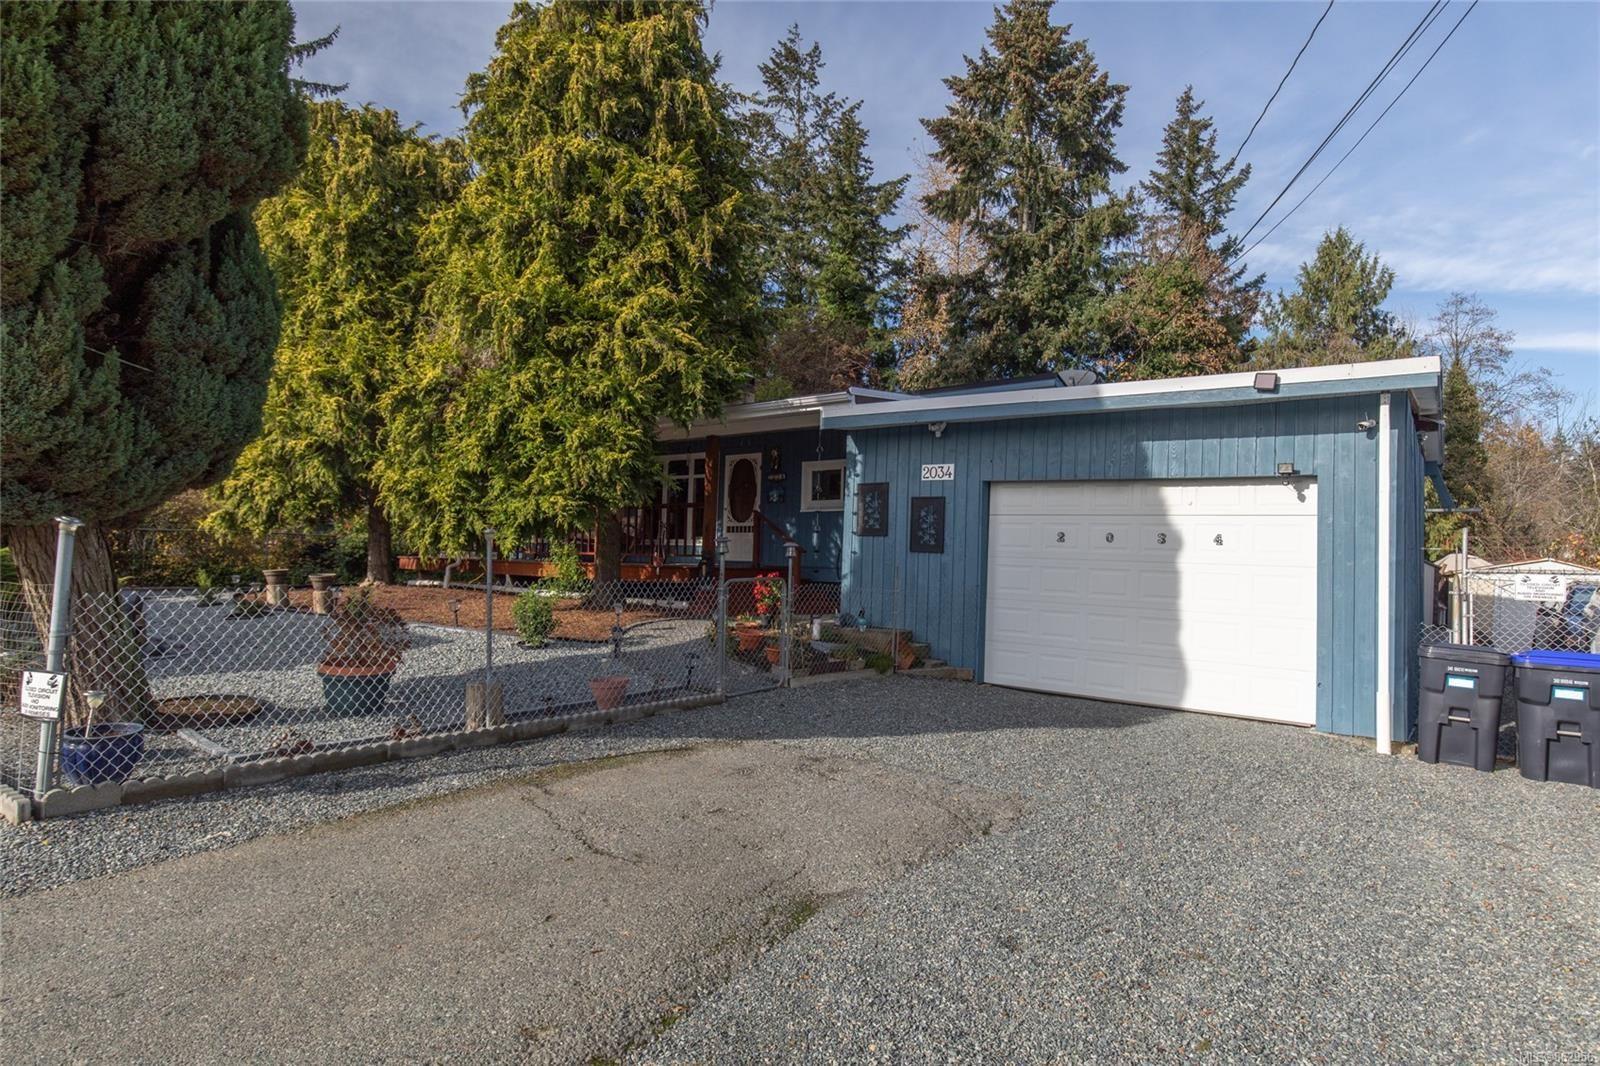 Main Photo: 2034 Holden Corso Rd in : Na Cedar House for sale (Nanaimo)  : MLS®# 862956